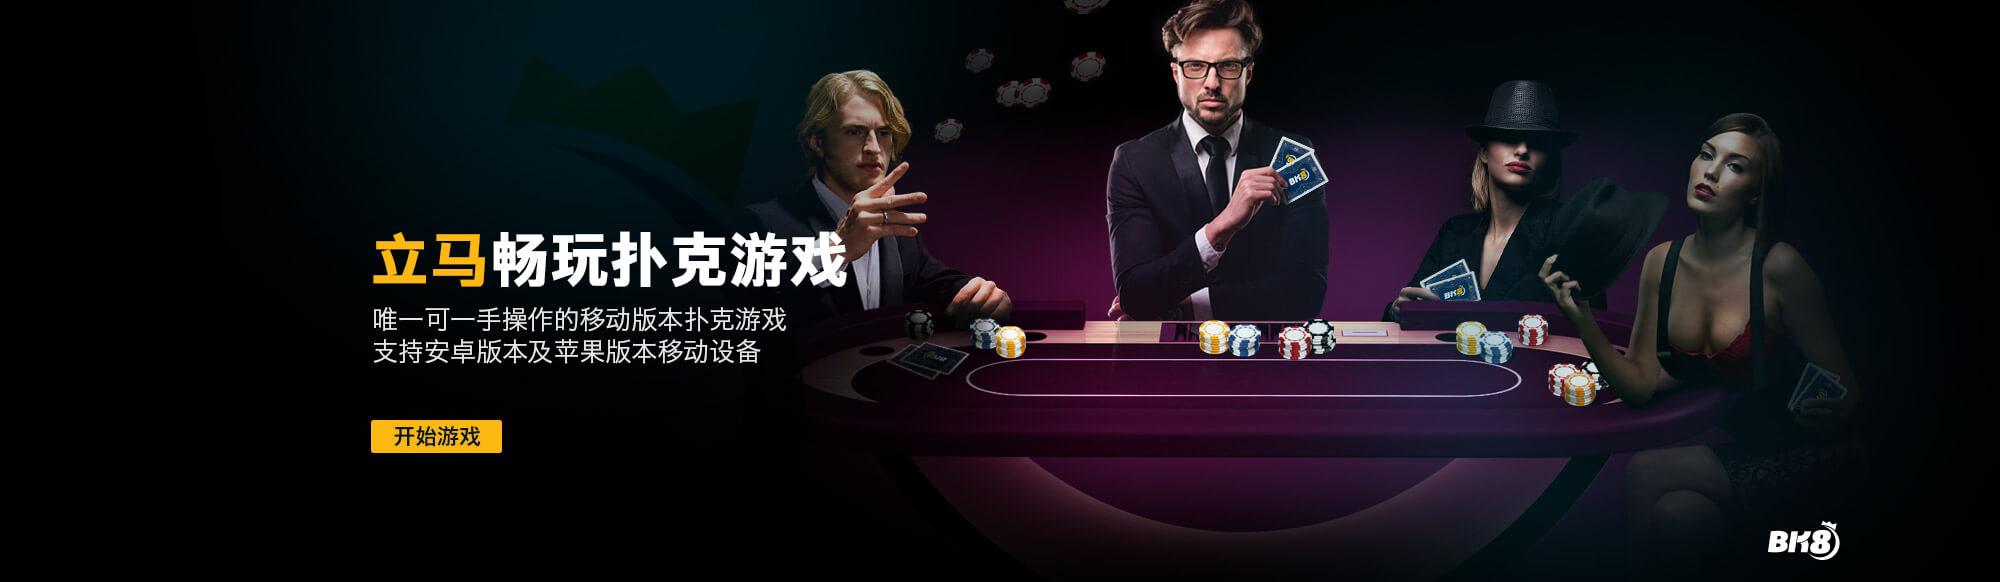 IDN 扑克